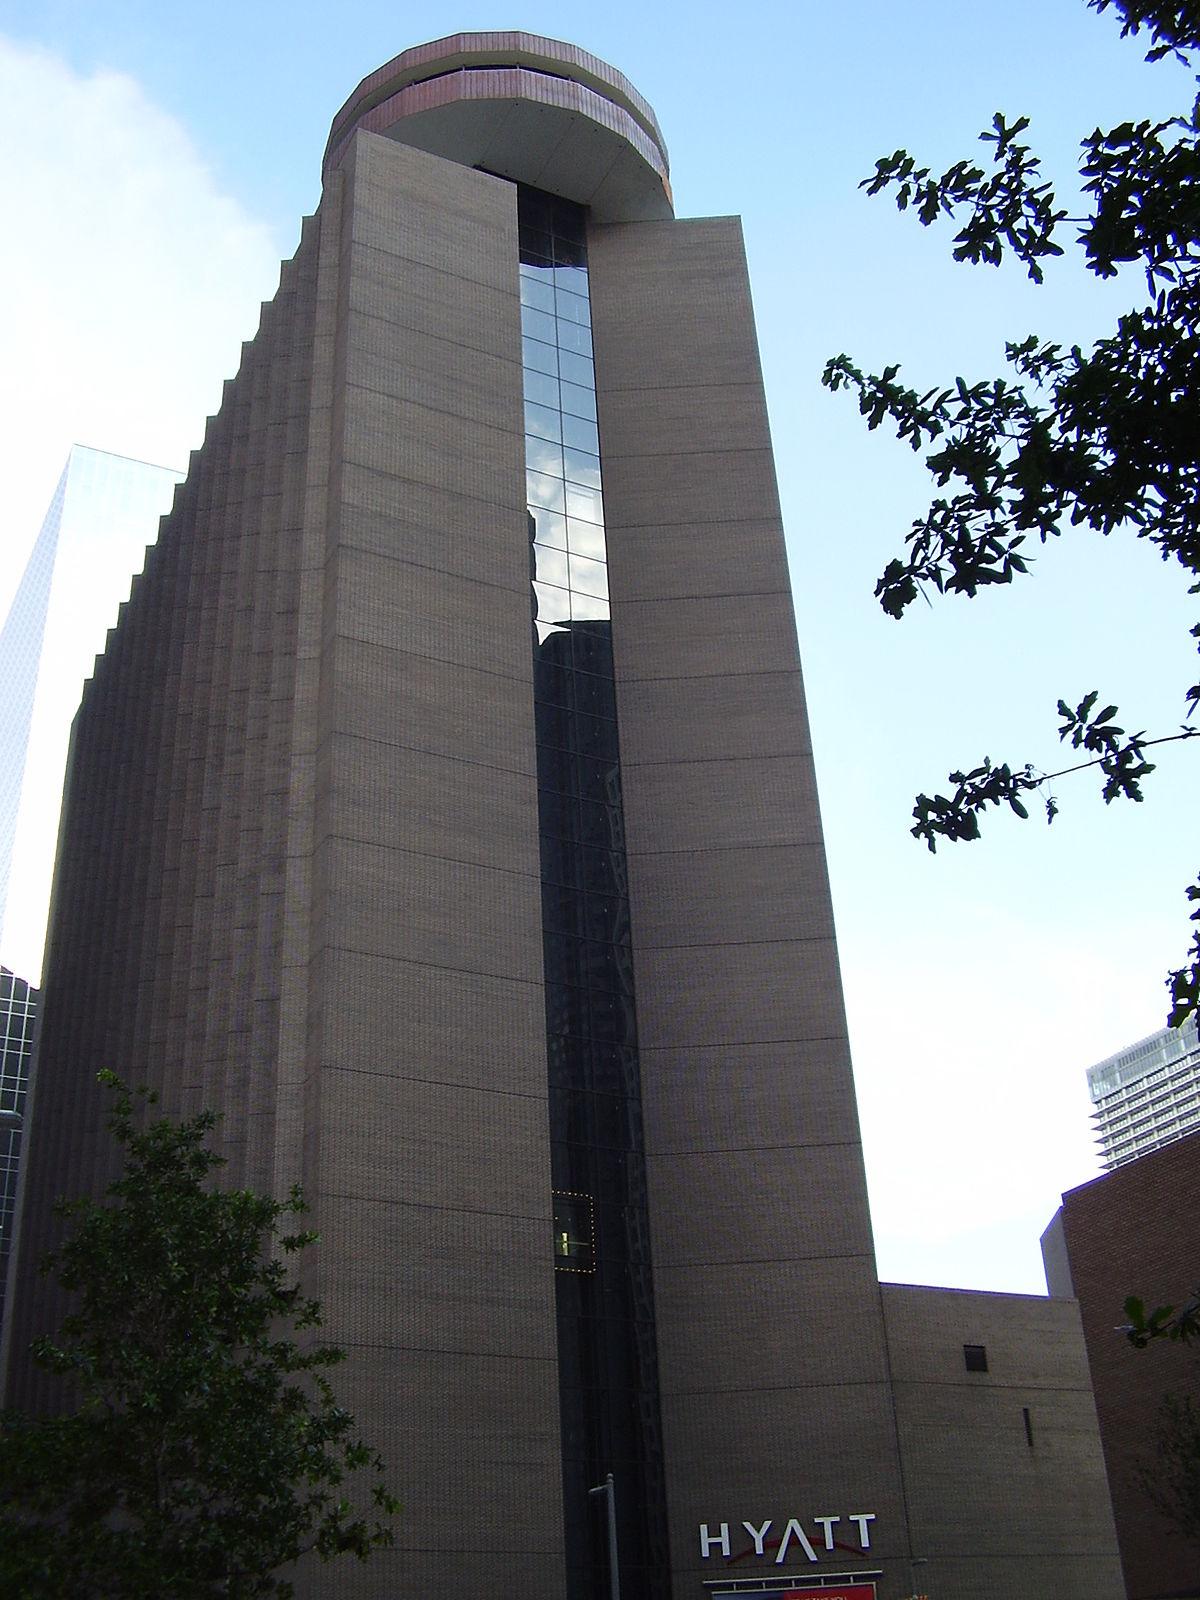 Hyatt Regency Houston Wikipedia